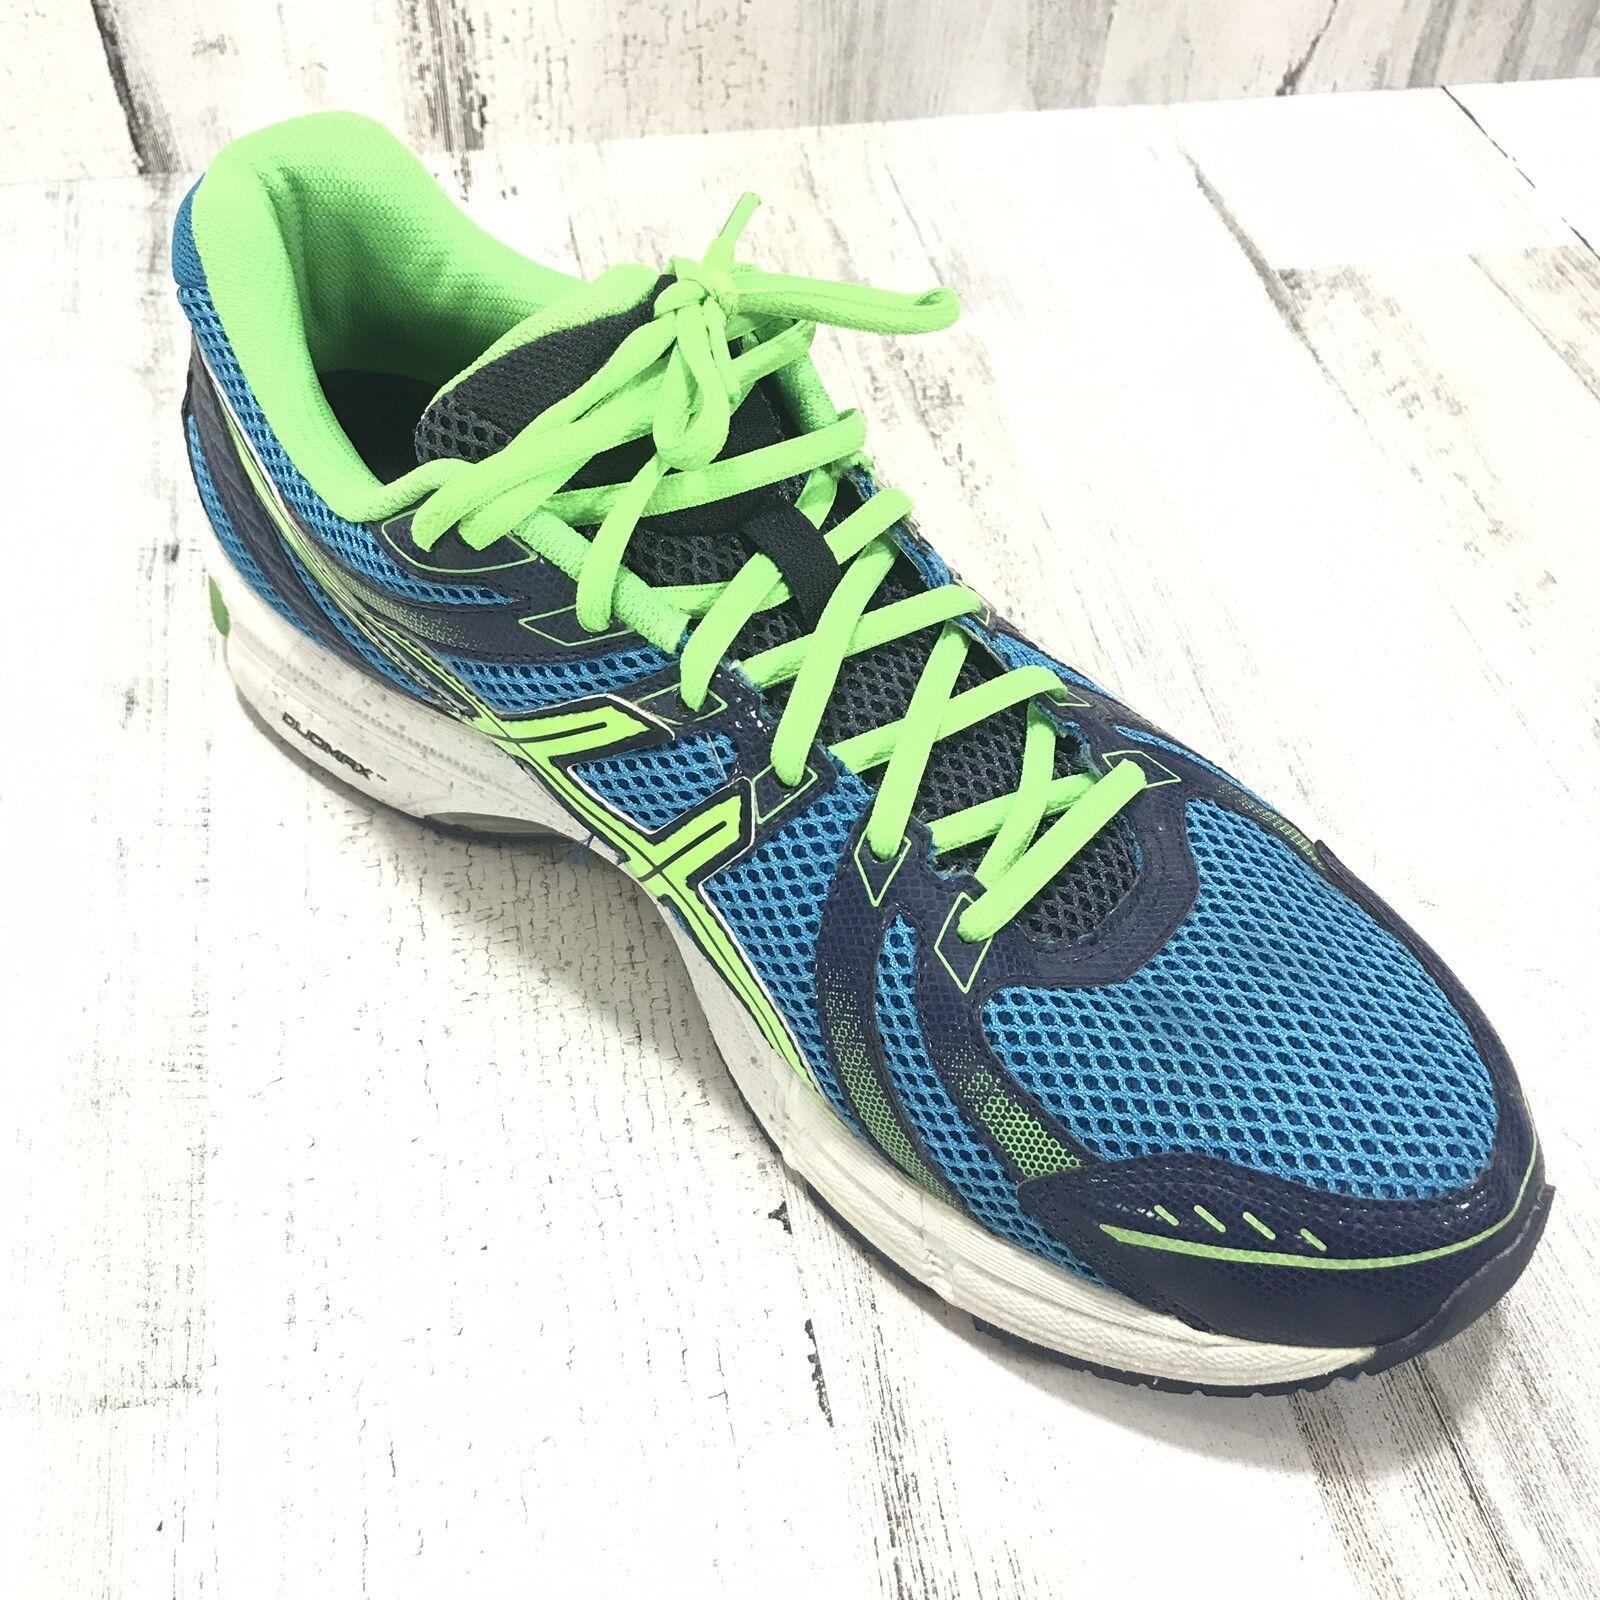 Asics T329Q GEL-Exalt Men's Running shoes Size 11.5